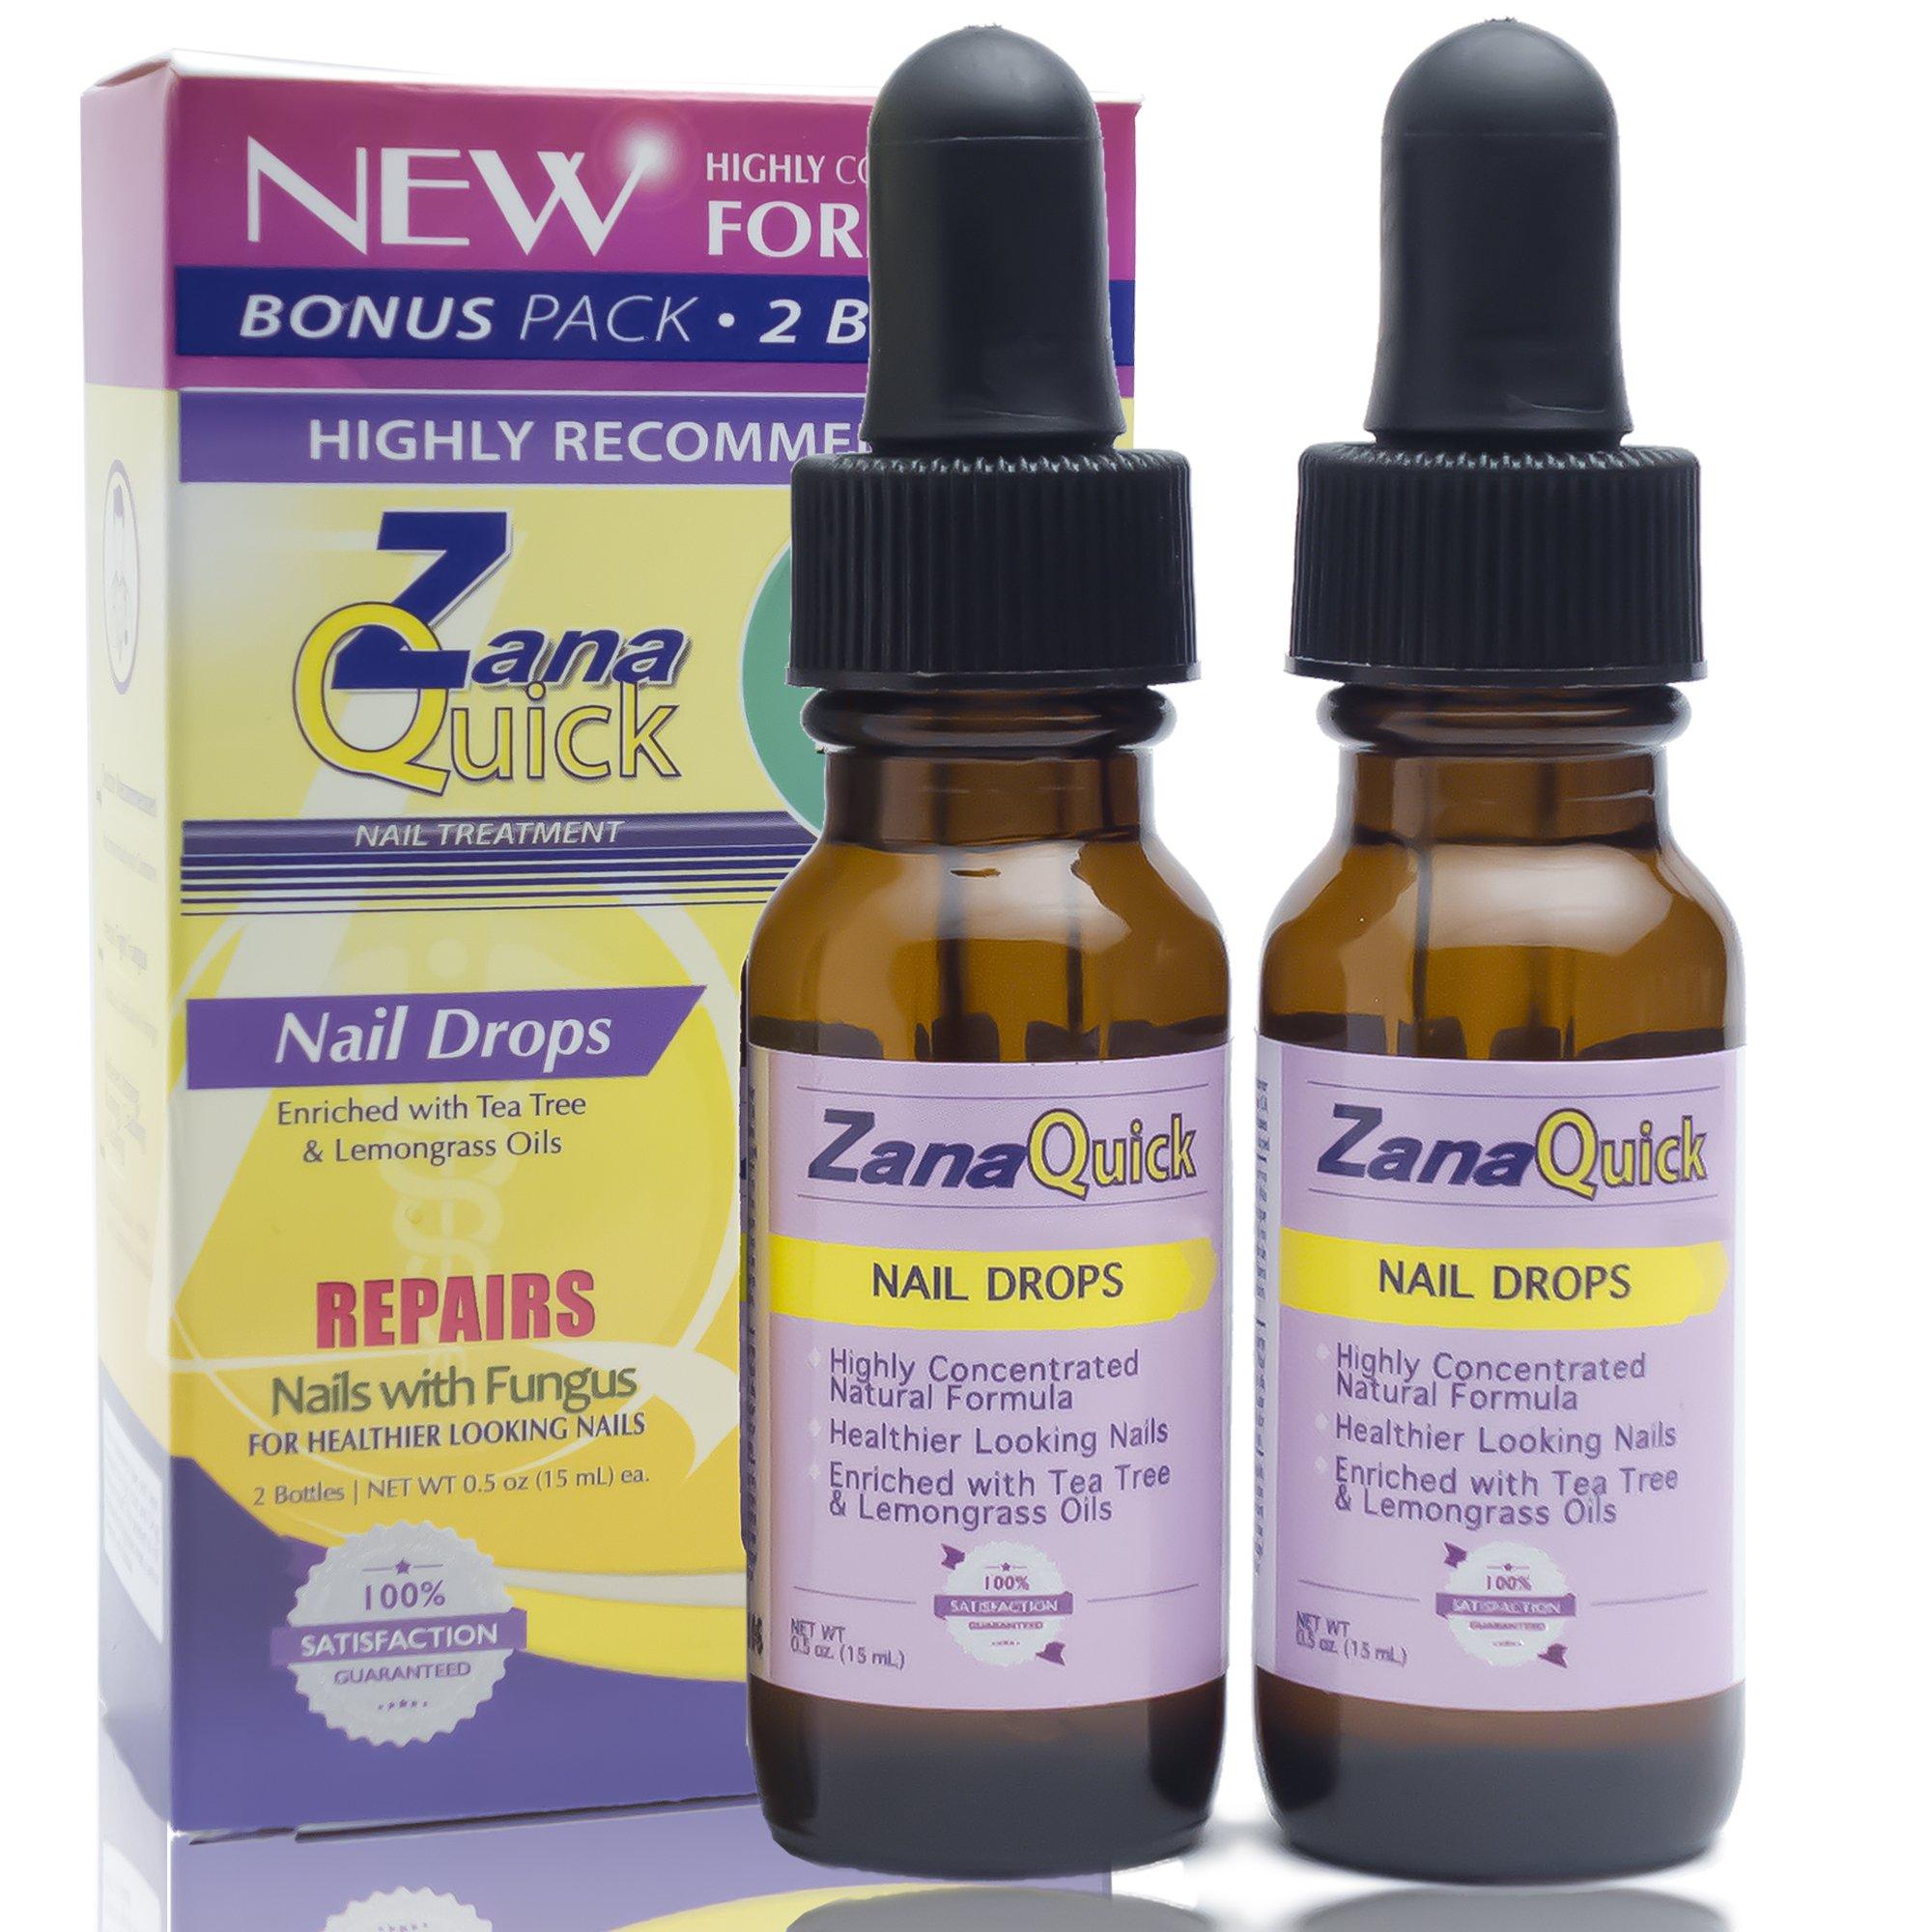 Zana Quick Antifungal Nail Drops Strong Toenail Fungus